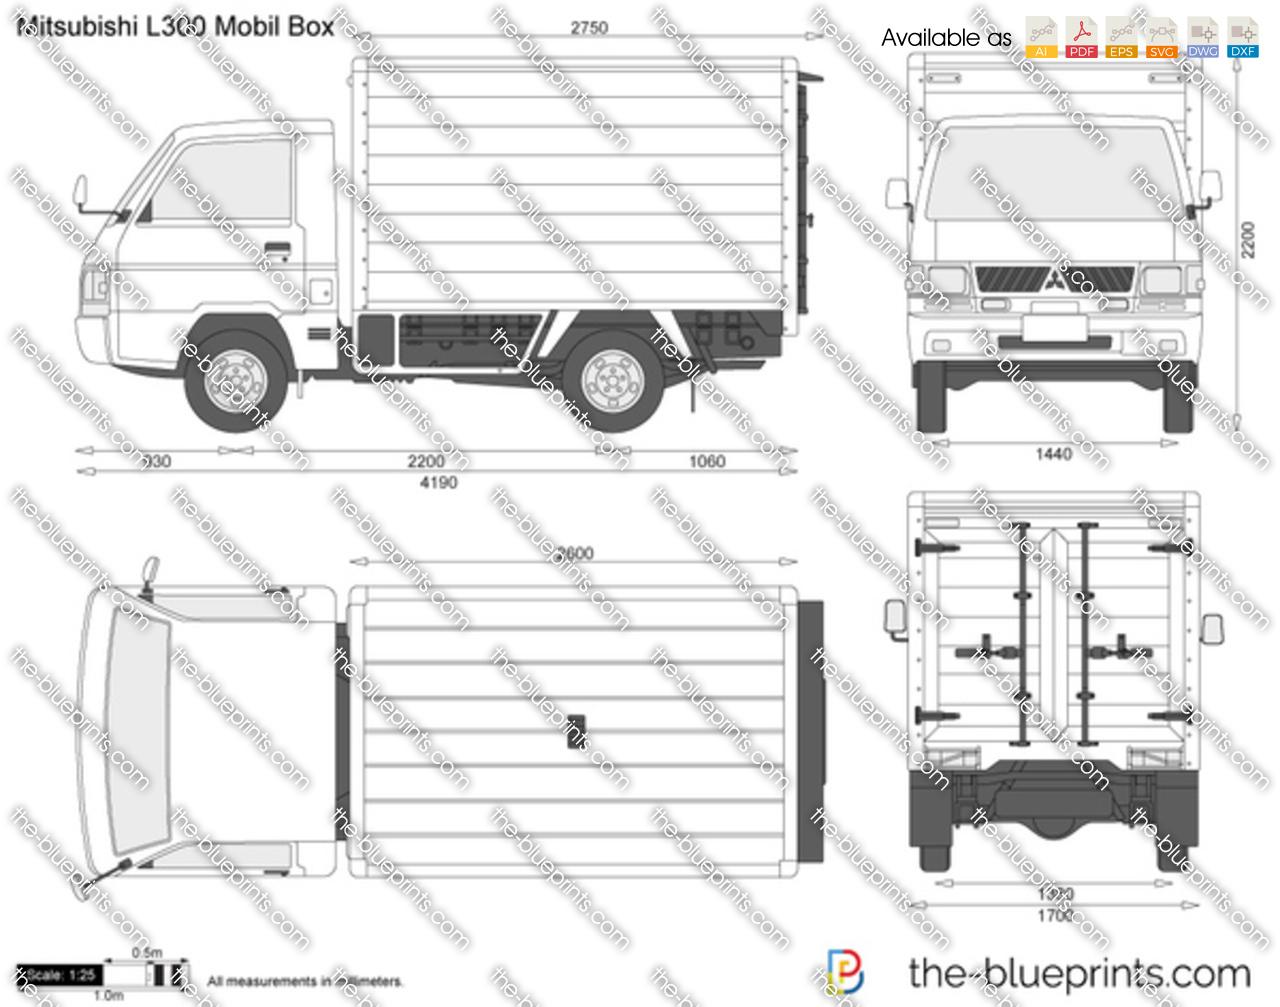 1986 Mitsubishi L300 Mobil Box